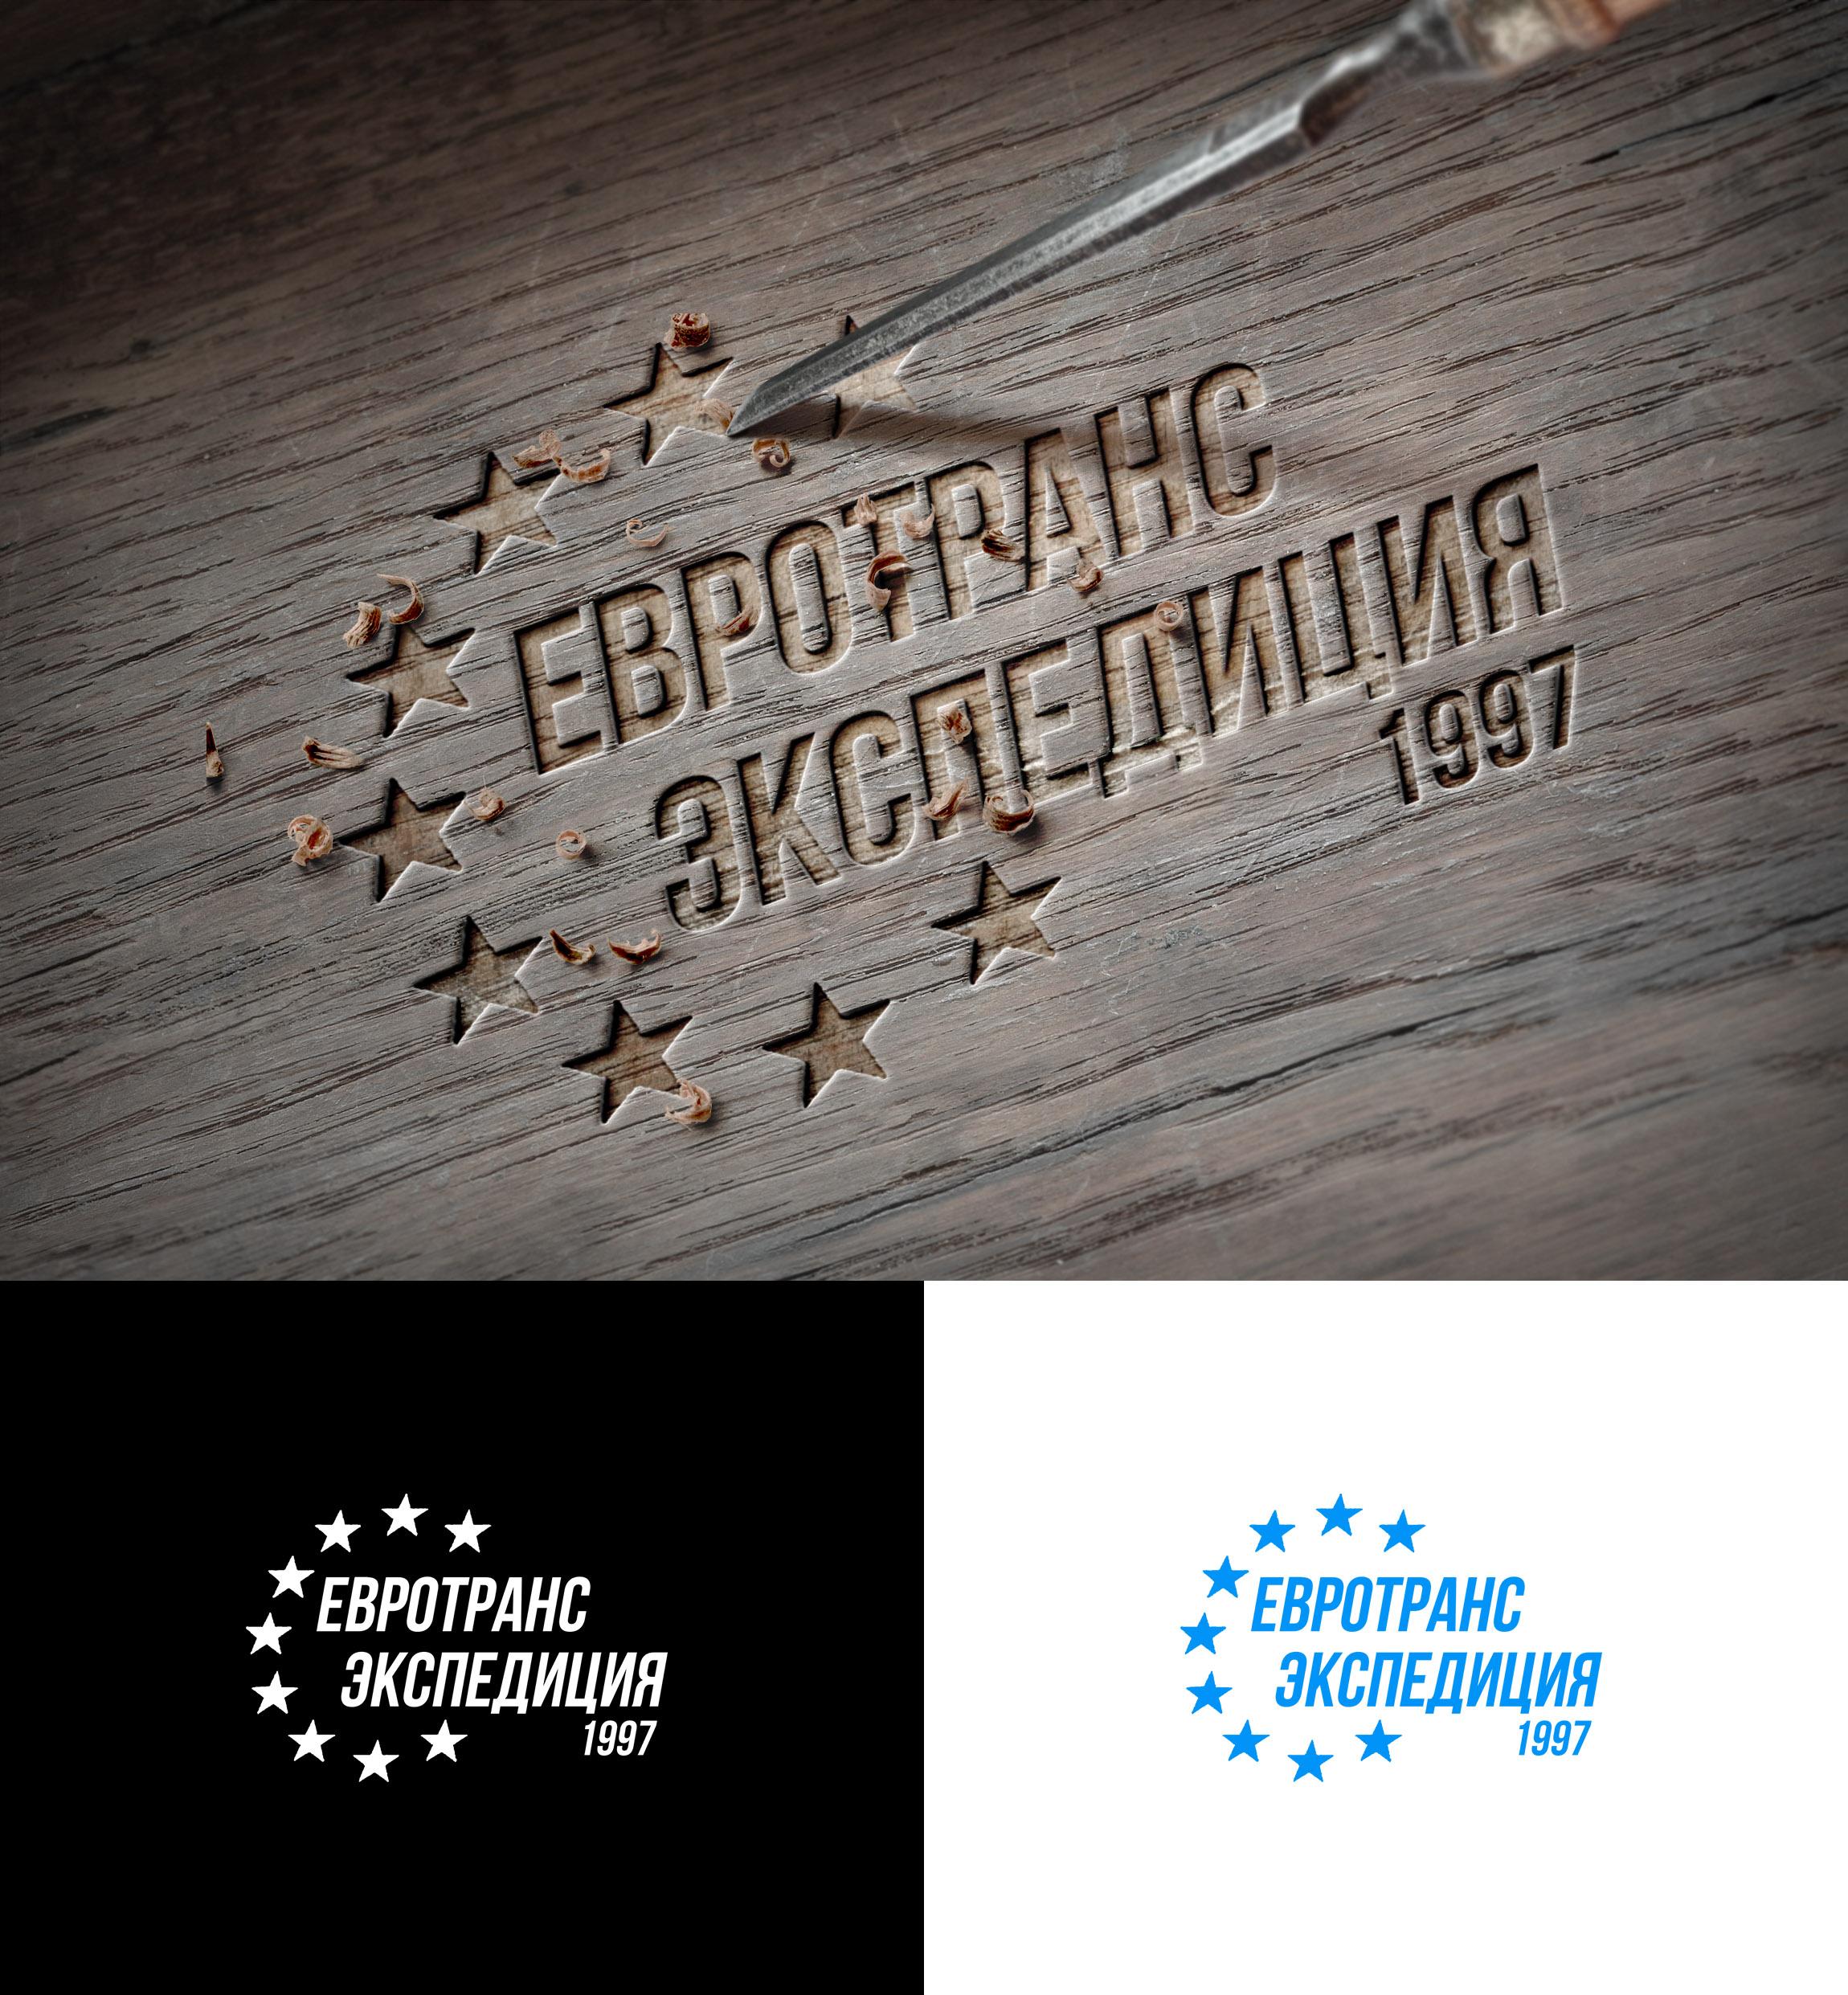 Предложите эволюцию логотипа экспедиторской компании  фото f_3145900ffa71846f.jpg